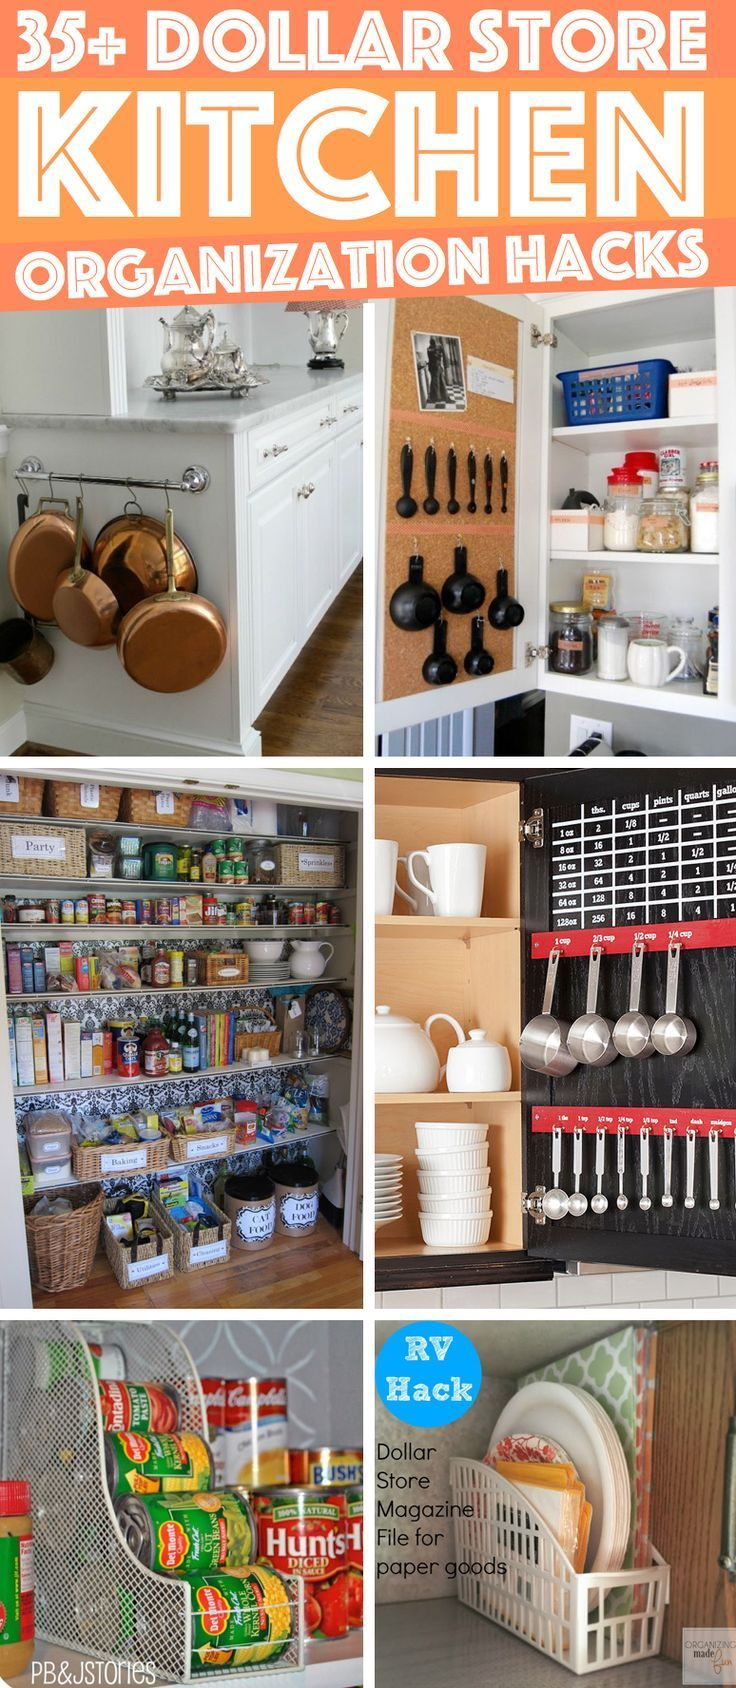 36 Dollar Store Kitchen Organization Hacks You